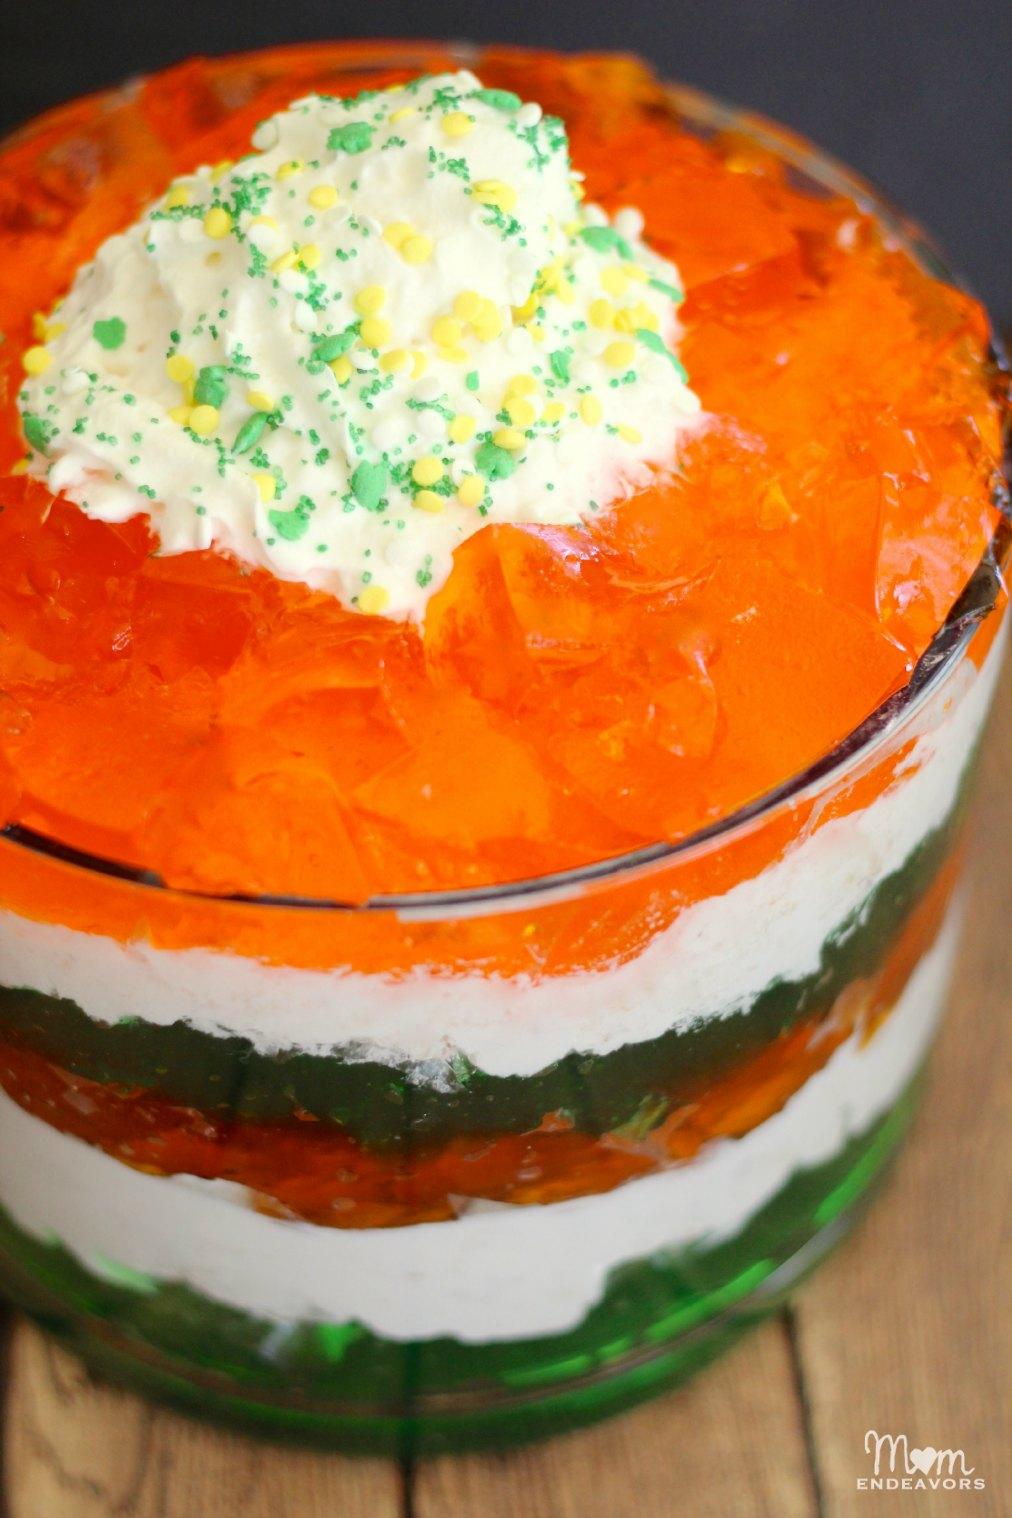 St. Patrick's Day Dessert Trifle